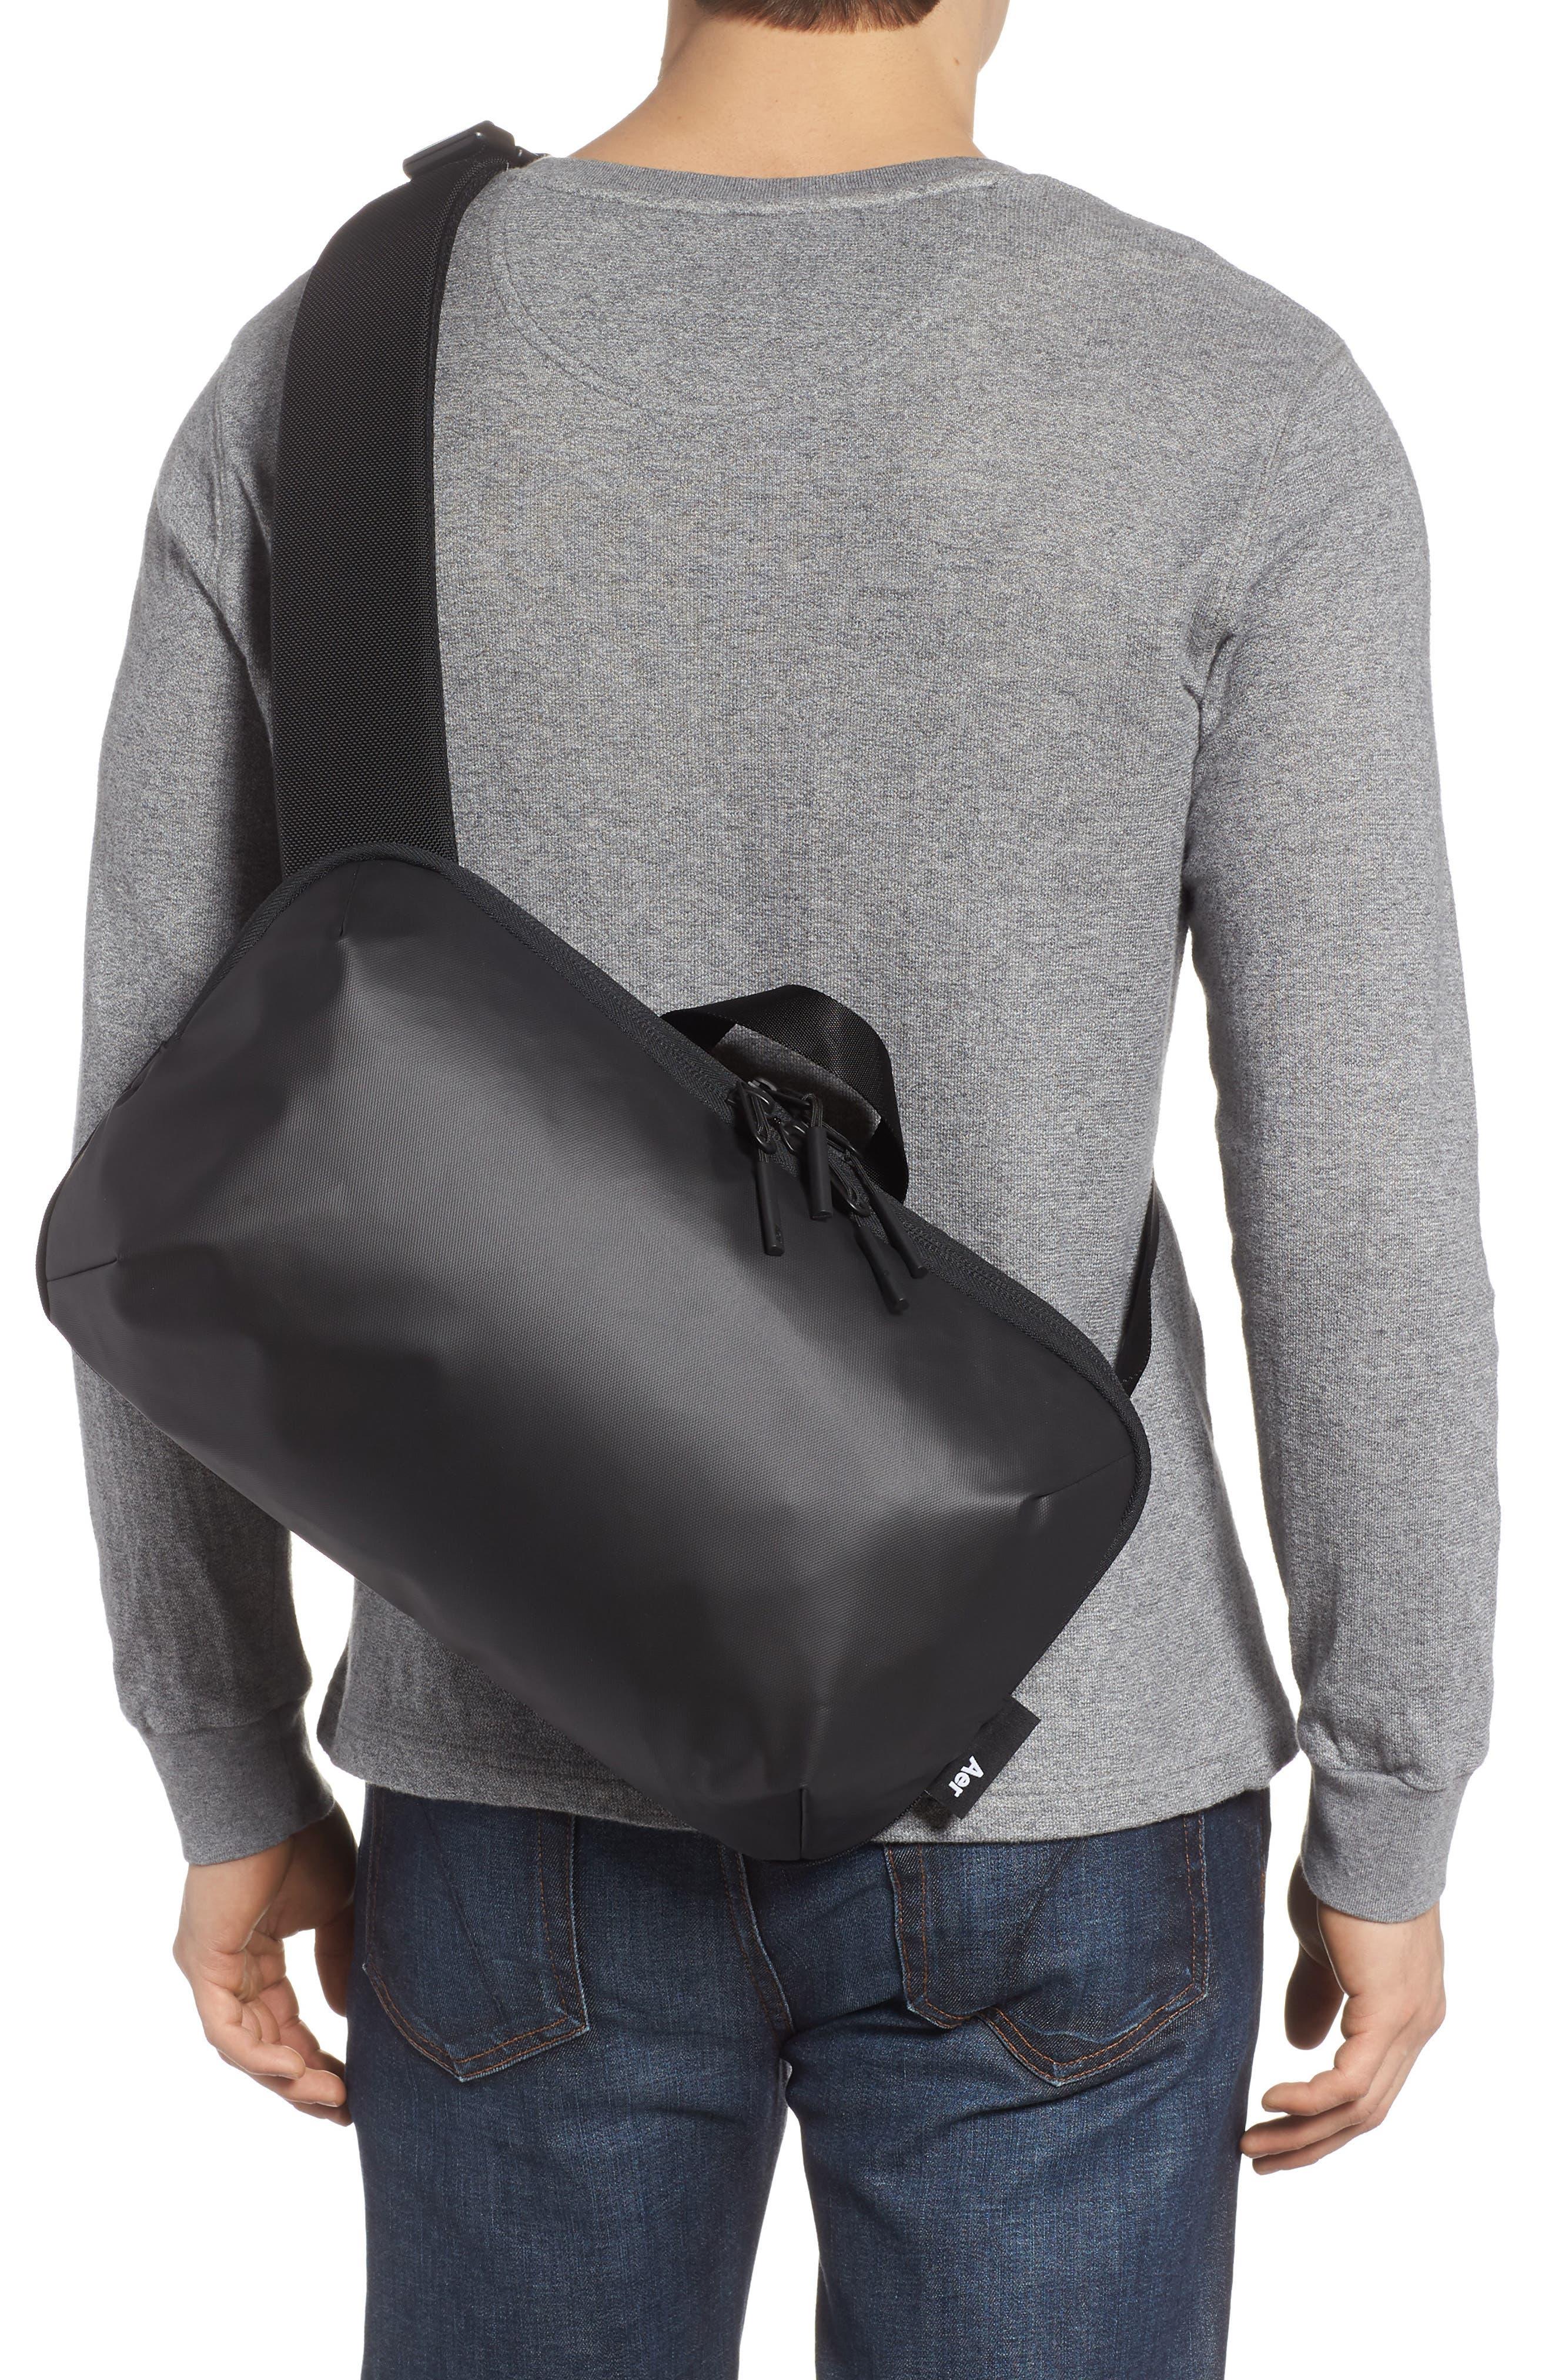 Tech Sling Bag,                             Alternate thumbnail 2, color,                             Black